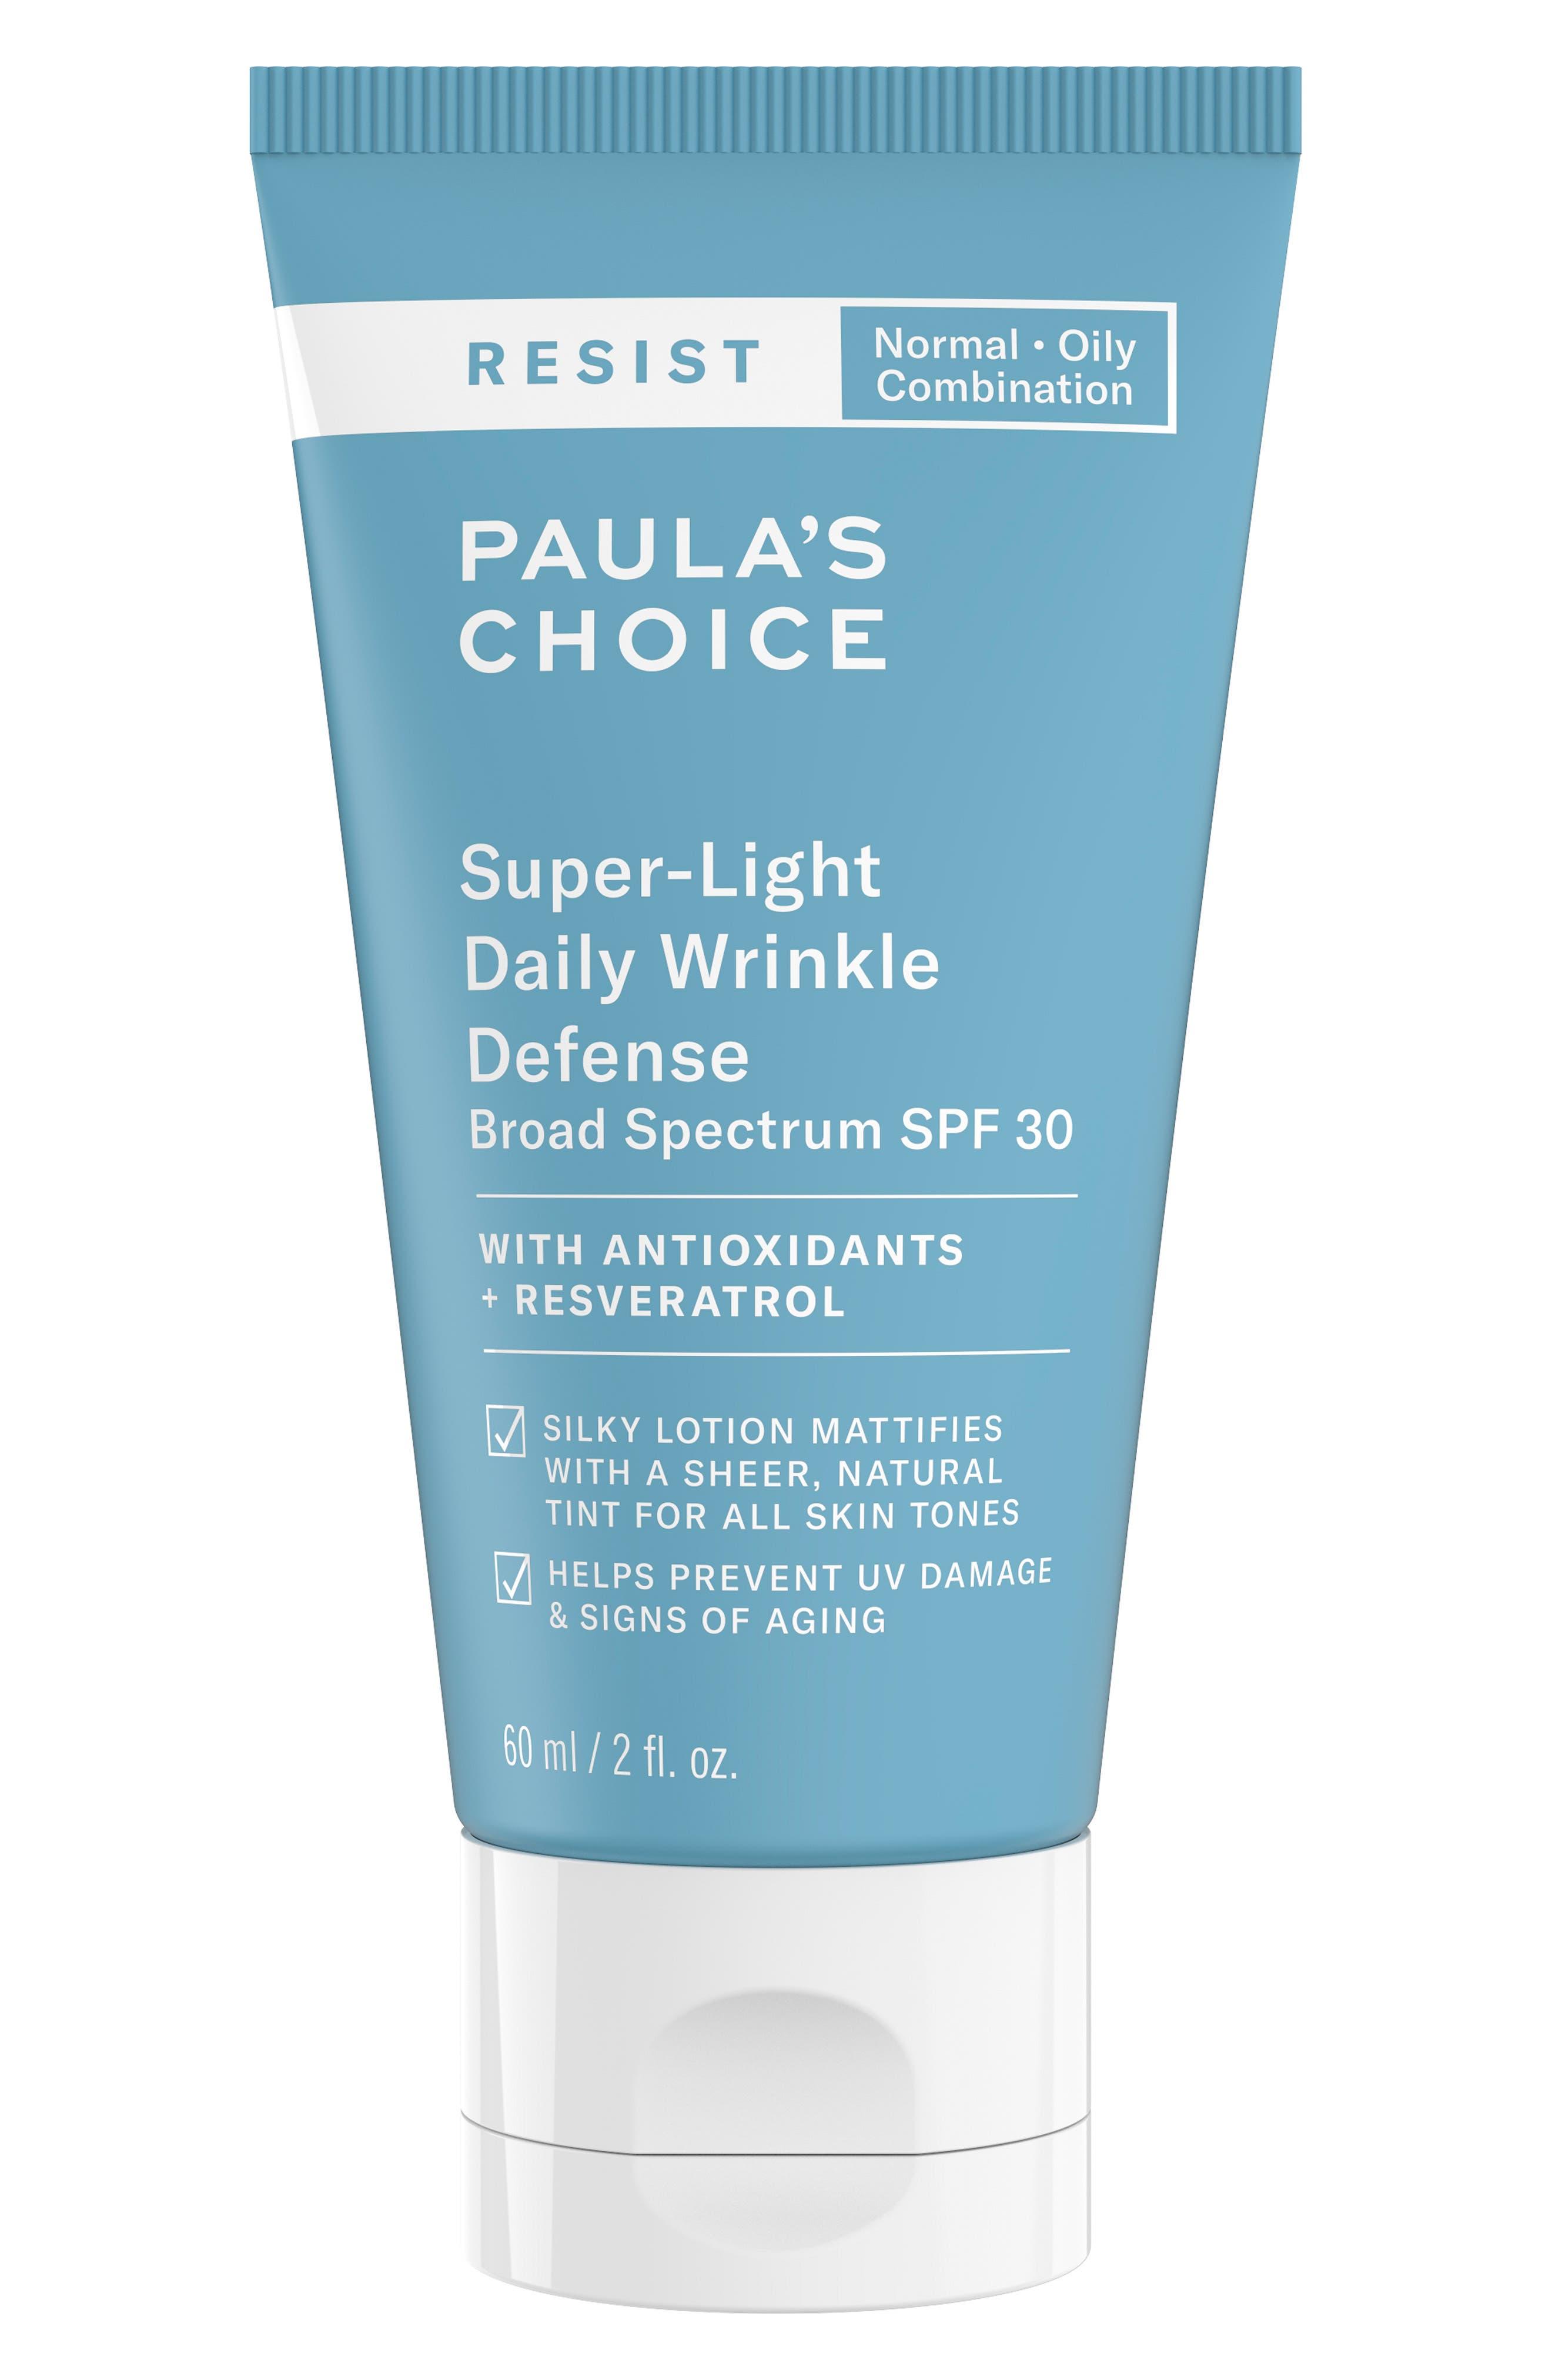 PAULA'S CHOICE Resist Super Light Wrinkle Defense SPF 30, Main, color, NO COLOR